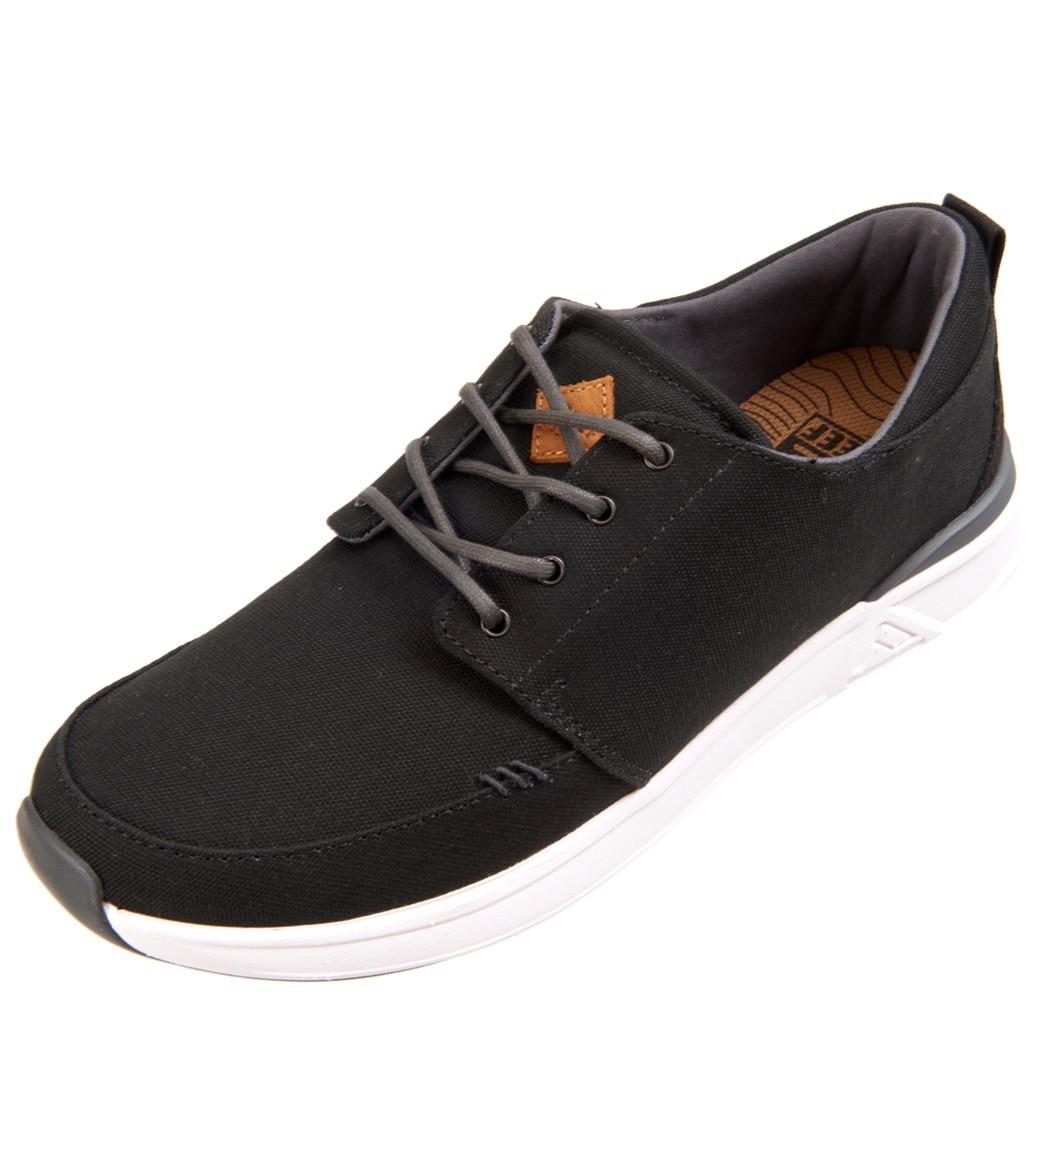 Reef Men's Reef Rover Low Shoe at